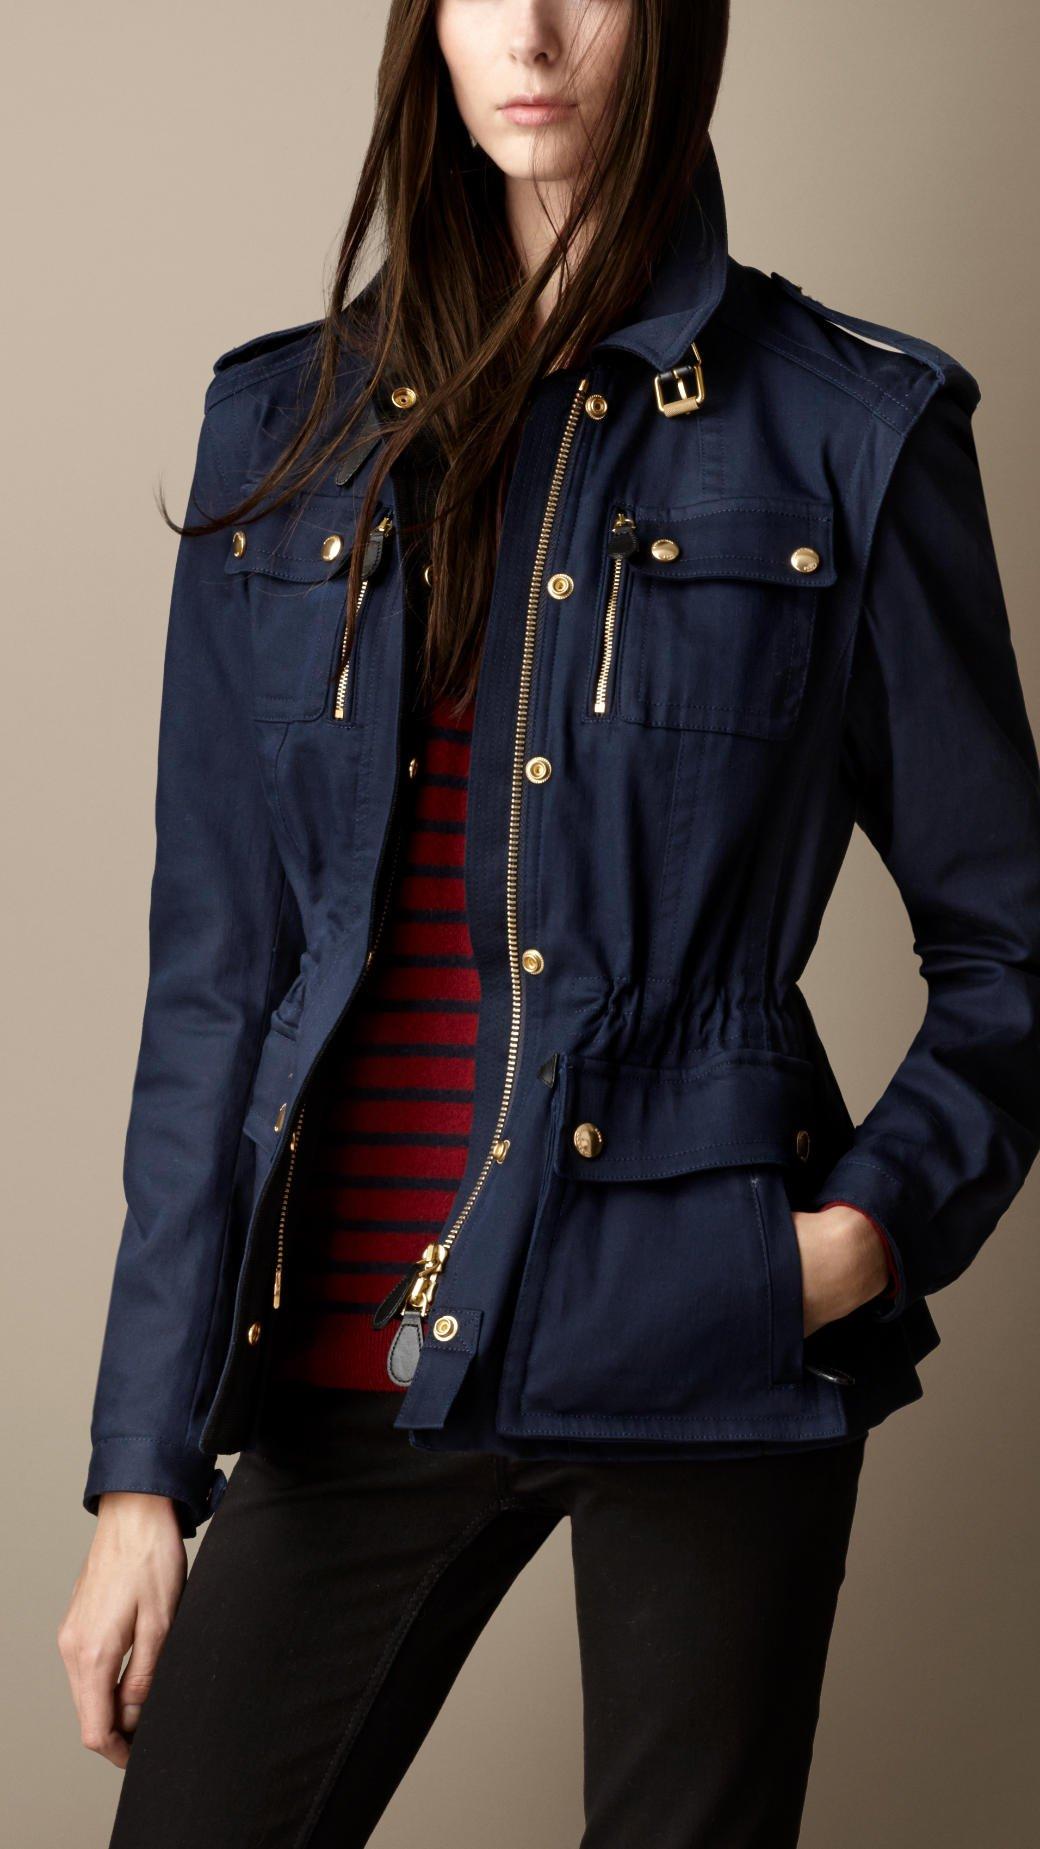 Burberry womens jackets